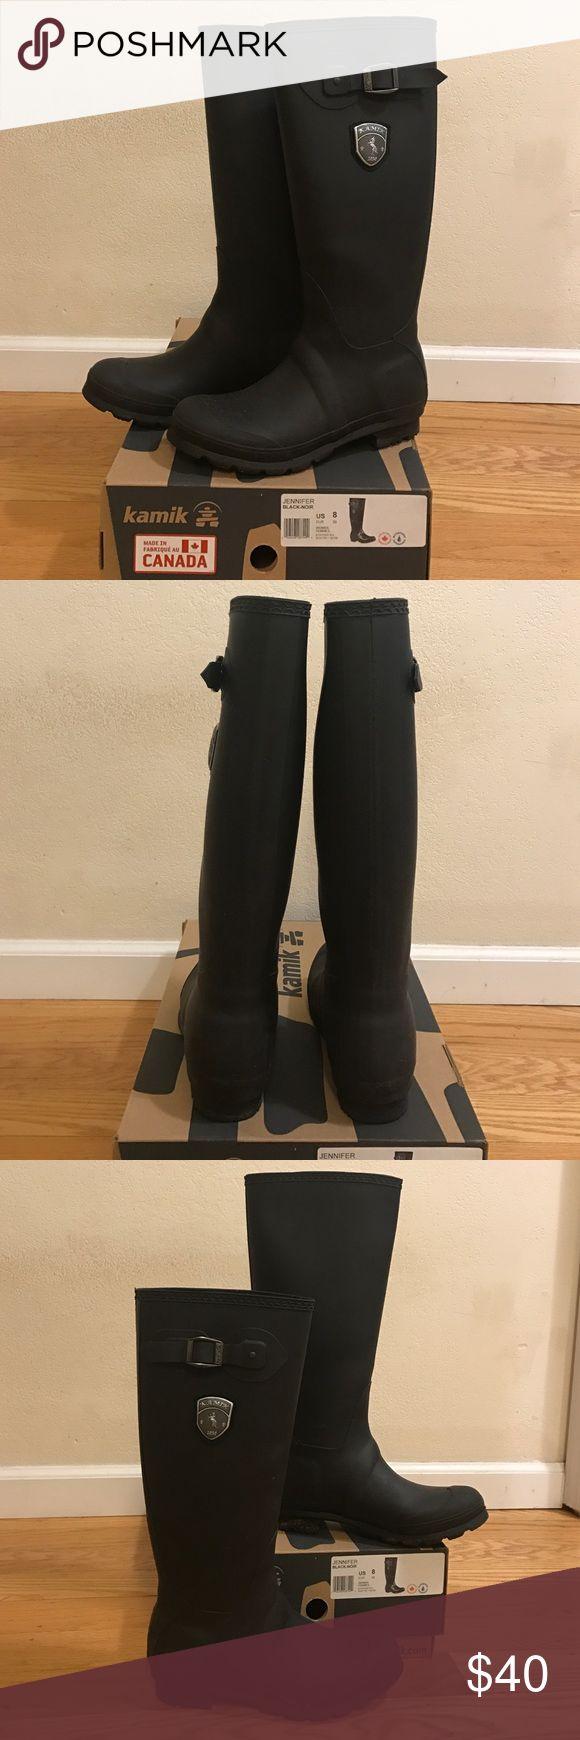 "Kamik rubber rain boot Kamik ""jennifer"" rubber rain boot in matte black. Worn a handful of times. Kamik Shoes Winter & Rain Boots"